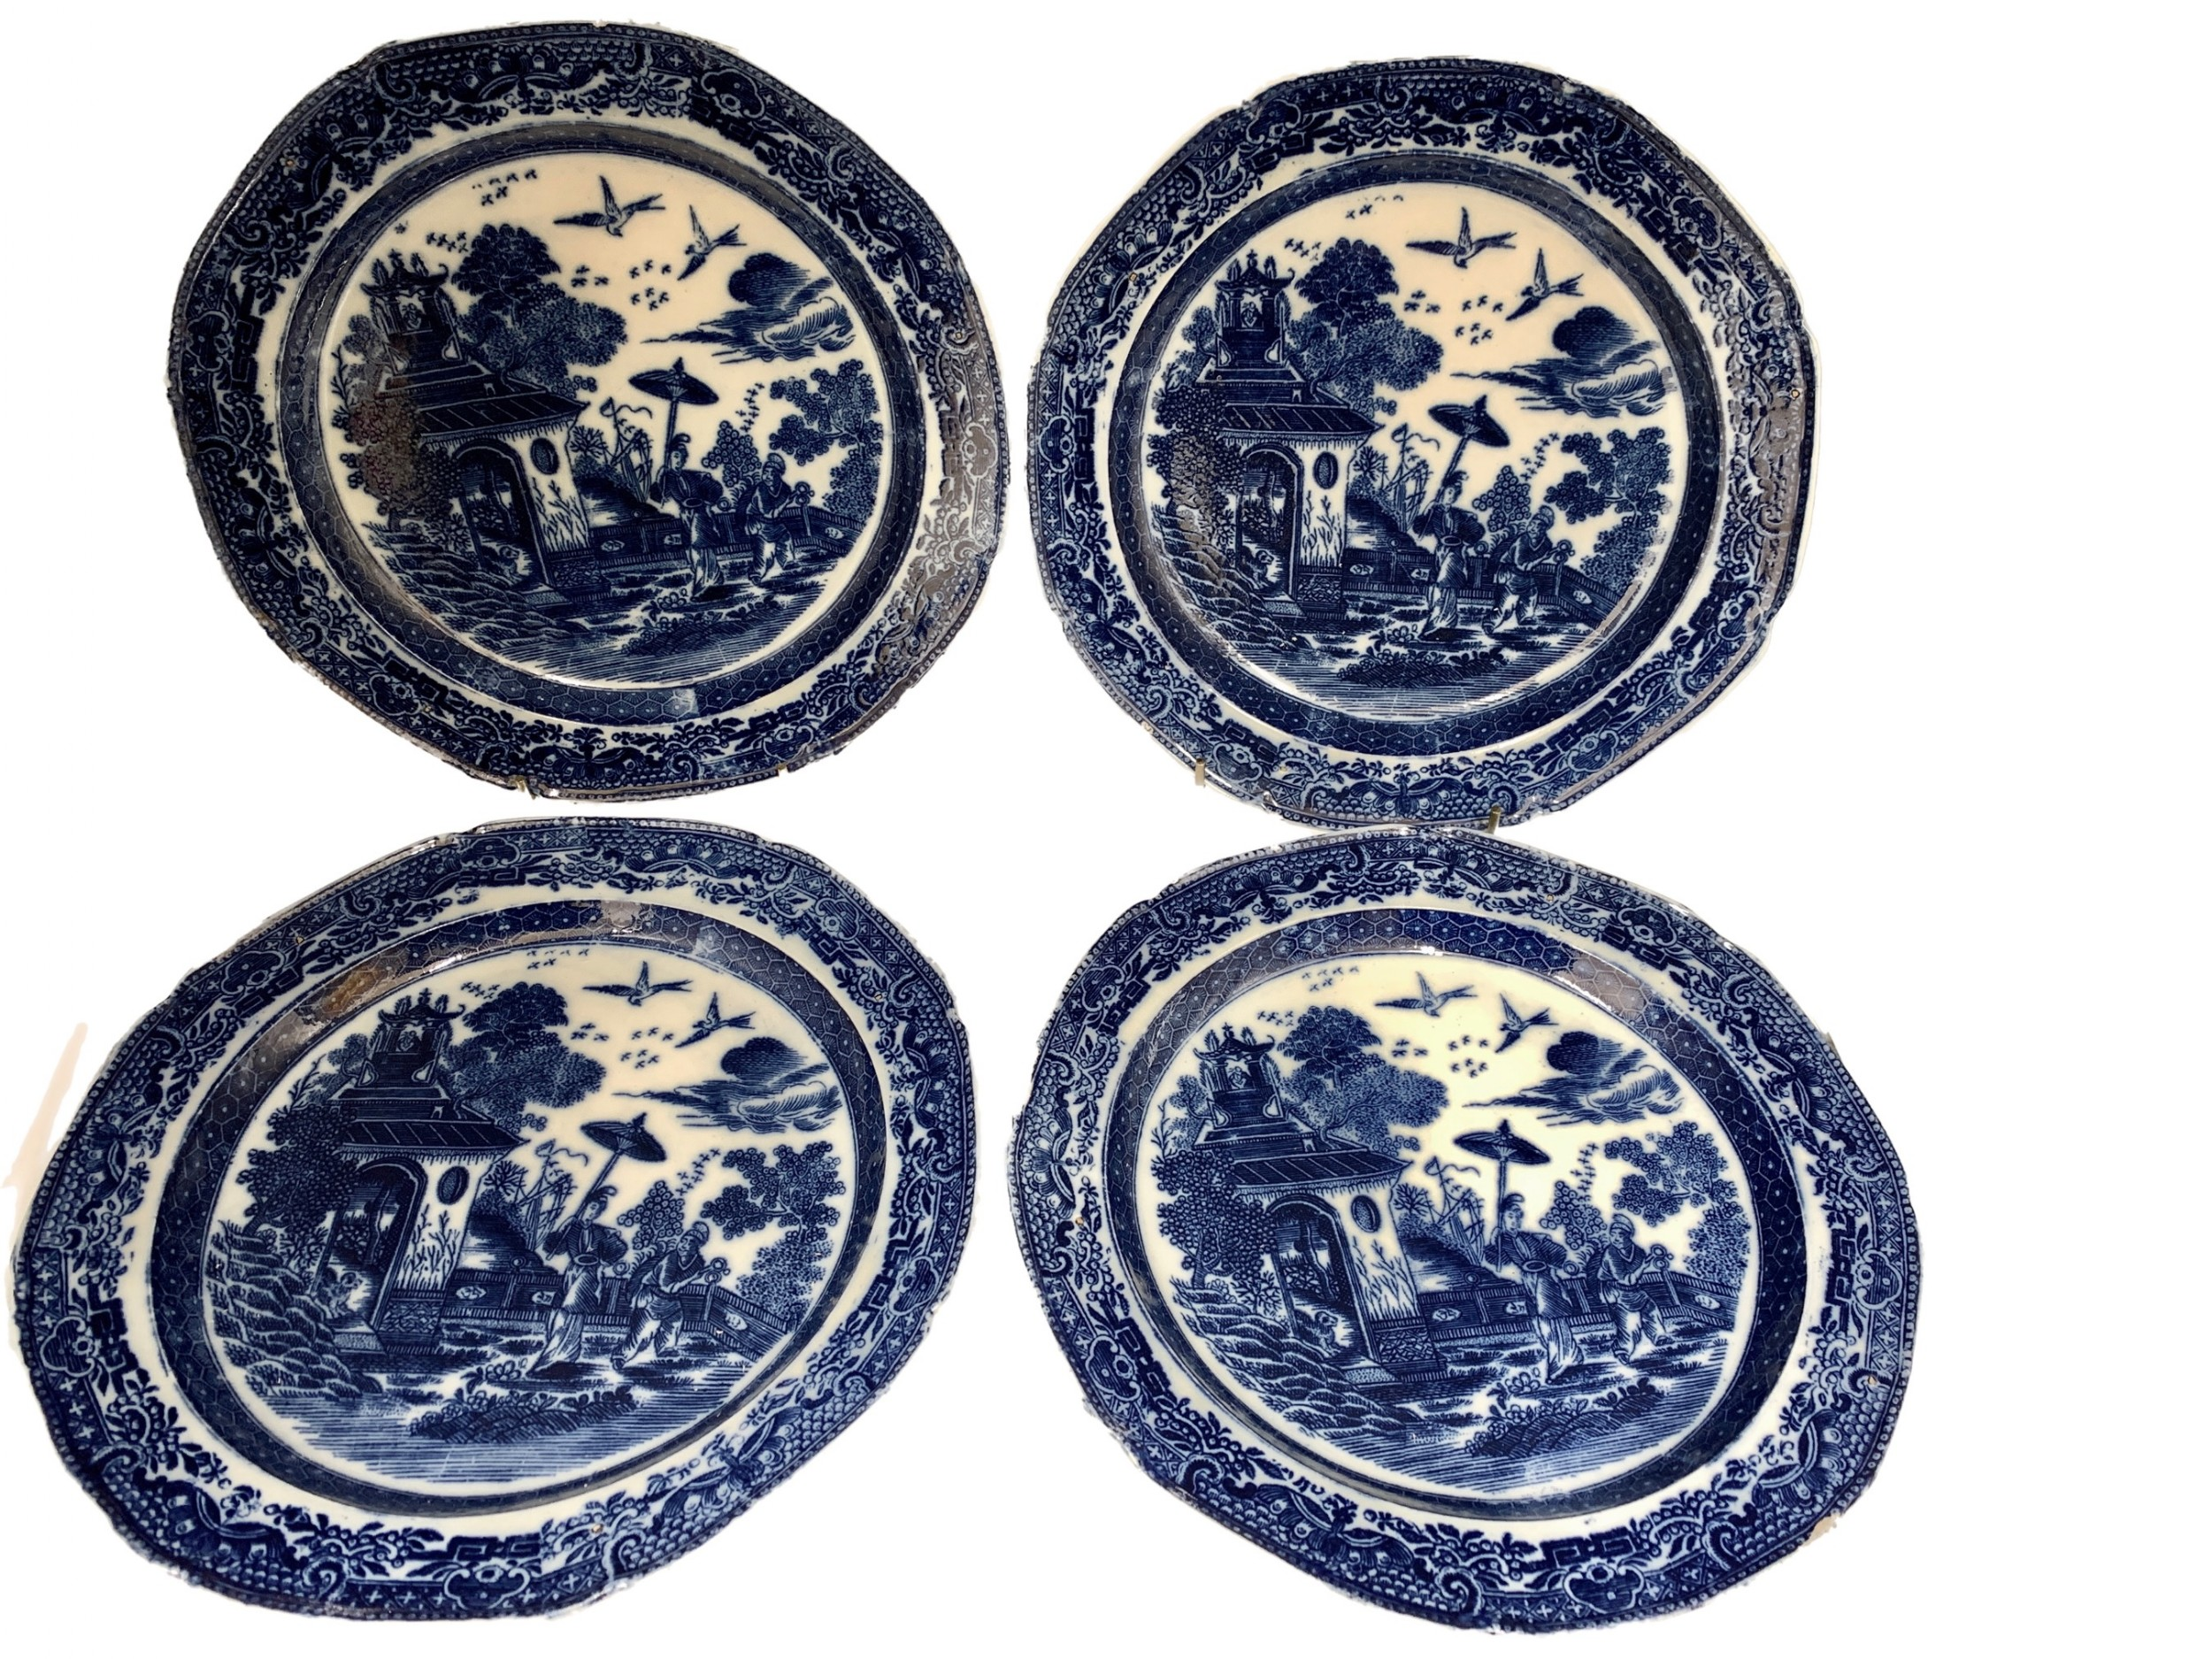 antique set four pearlware blue white transfer printed plates circa 1800